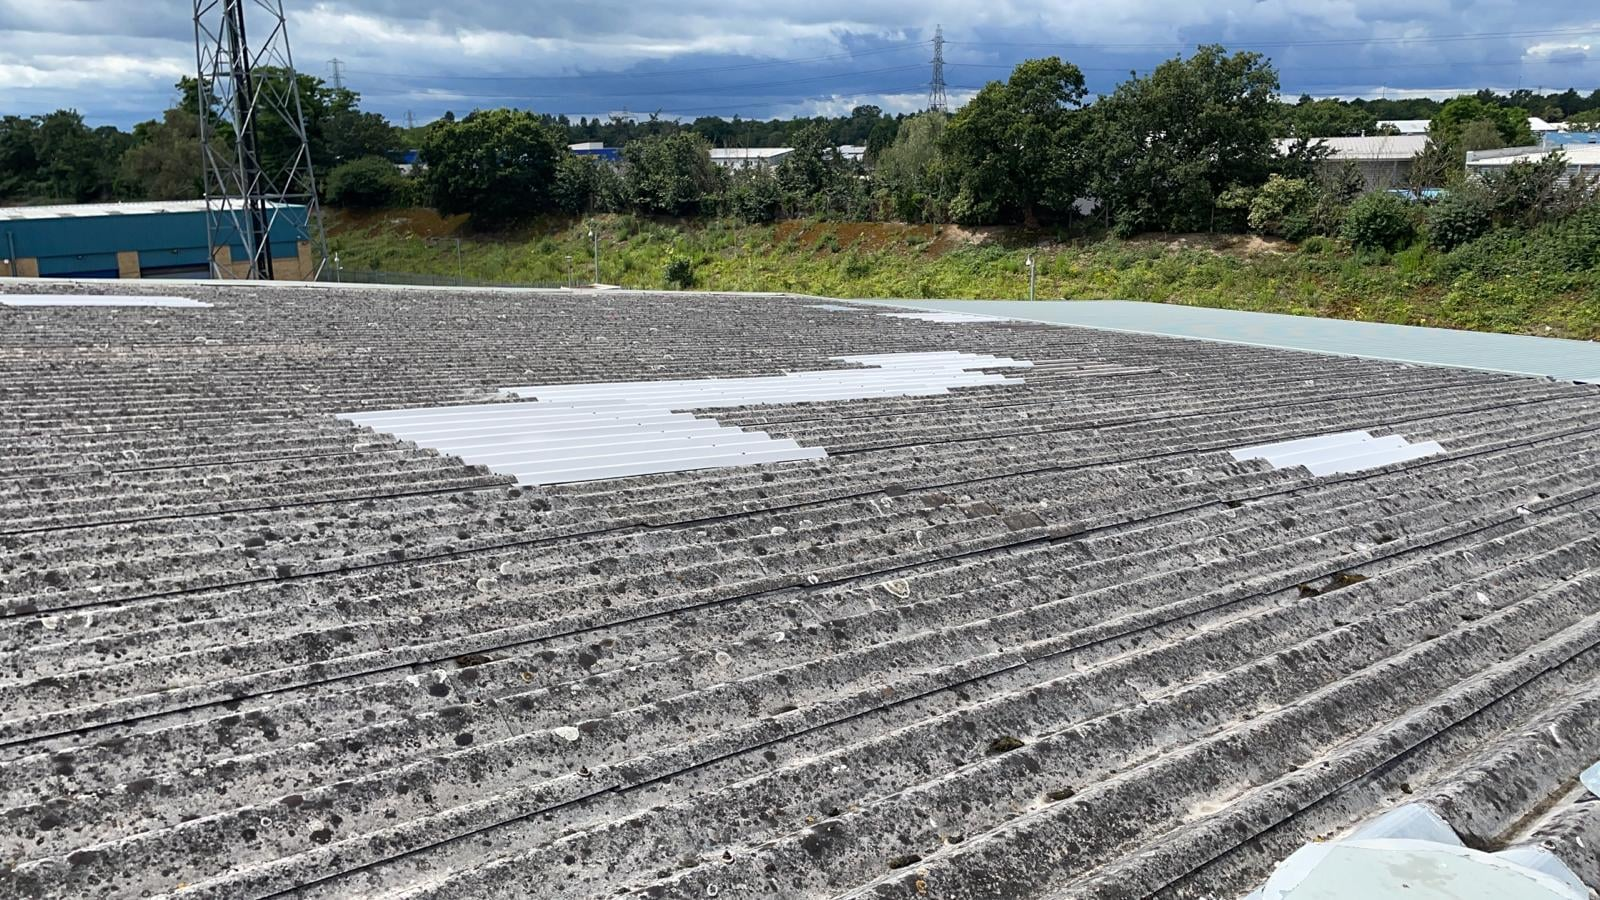 Repairs to a Factory - Warehouse roof in Weybridge Surrey